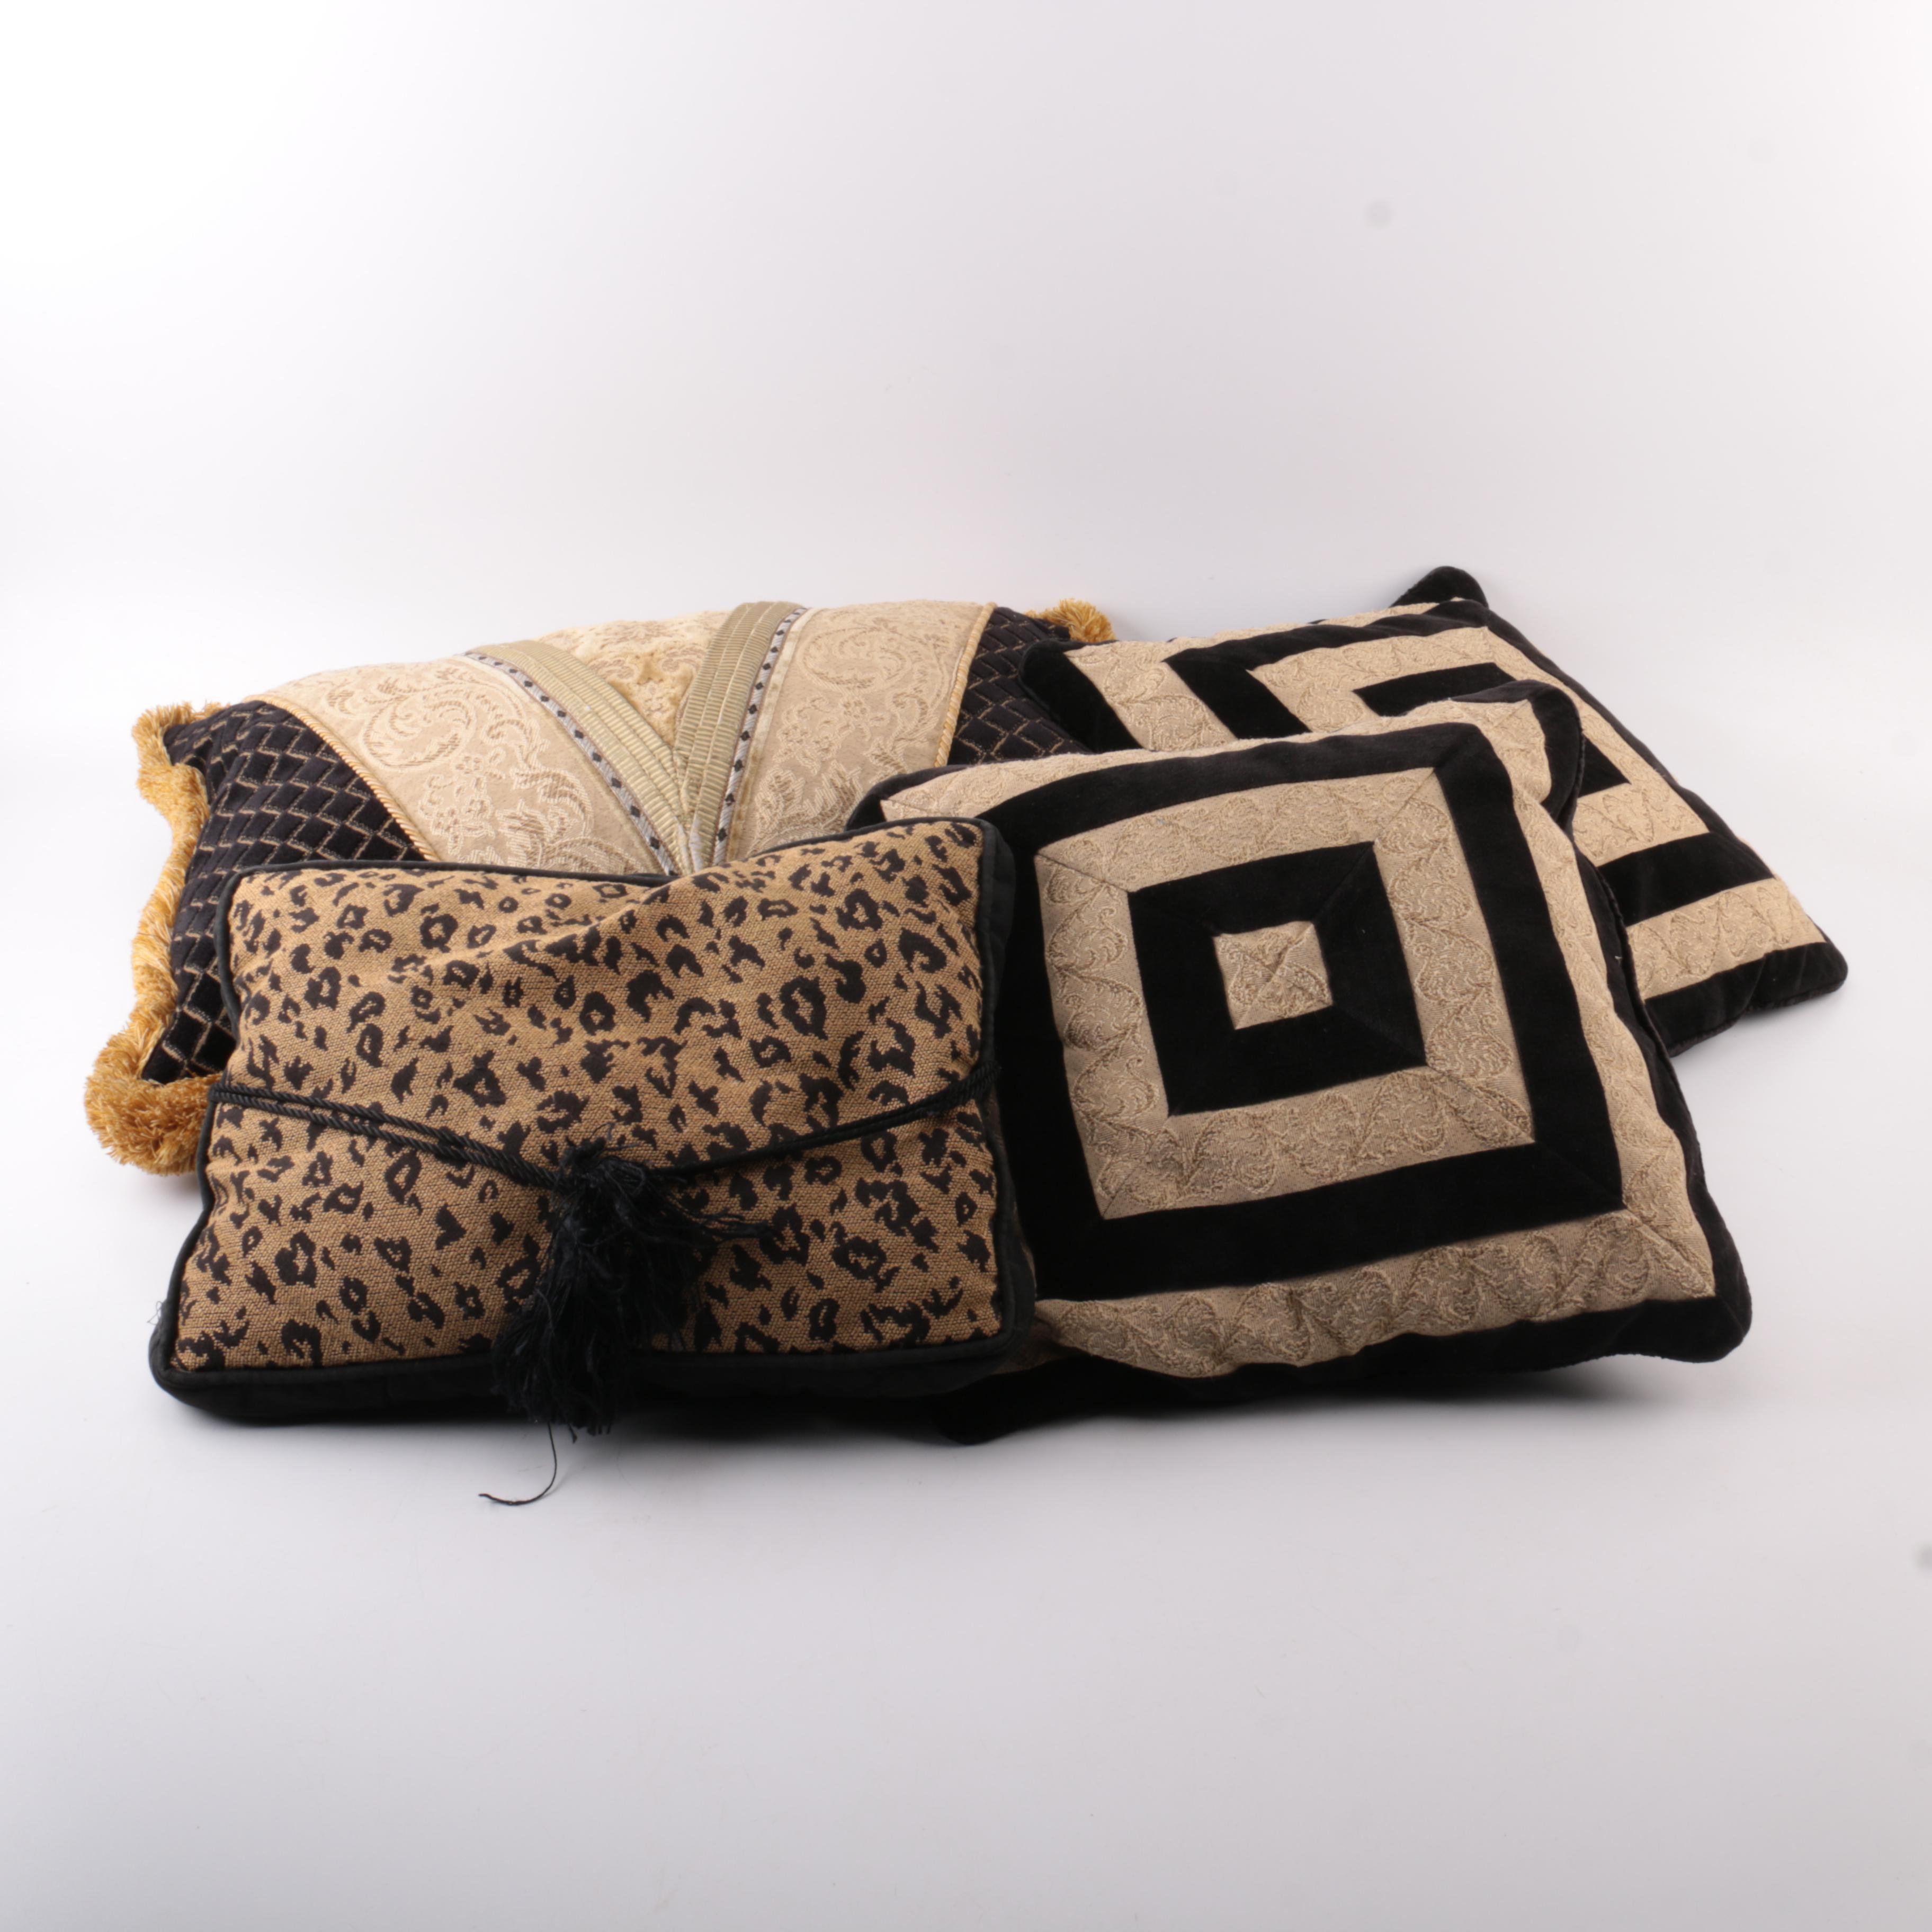 Assortment of Throw Pillows